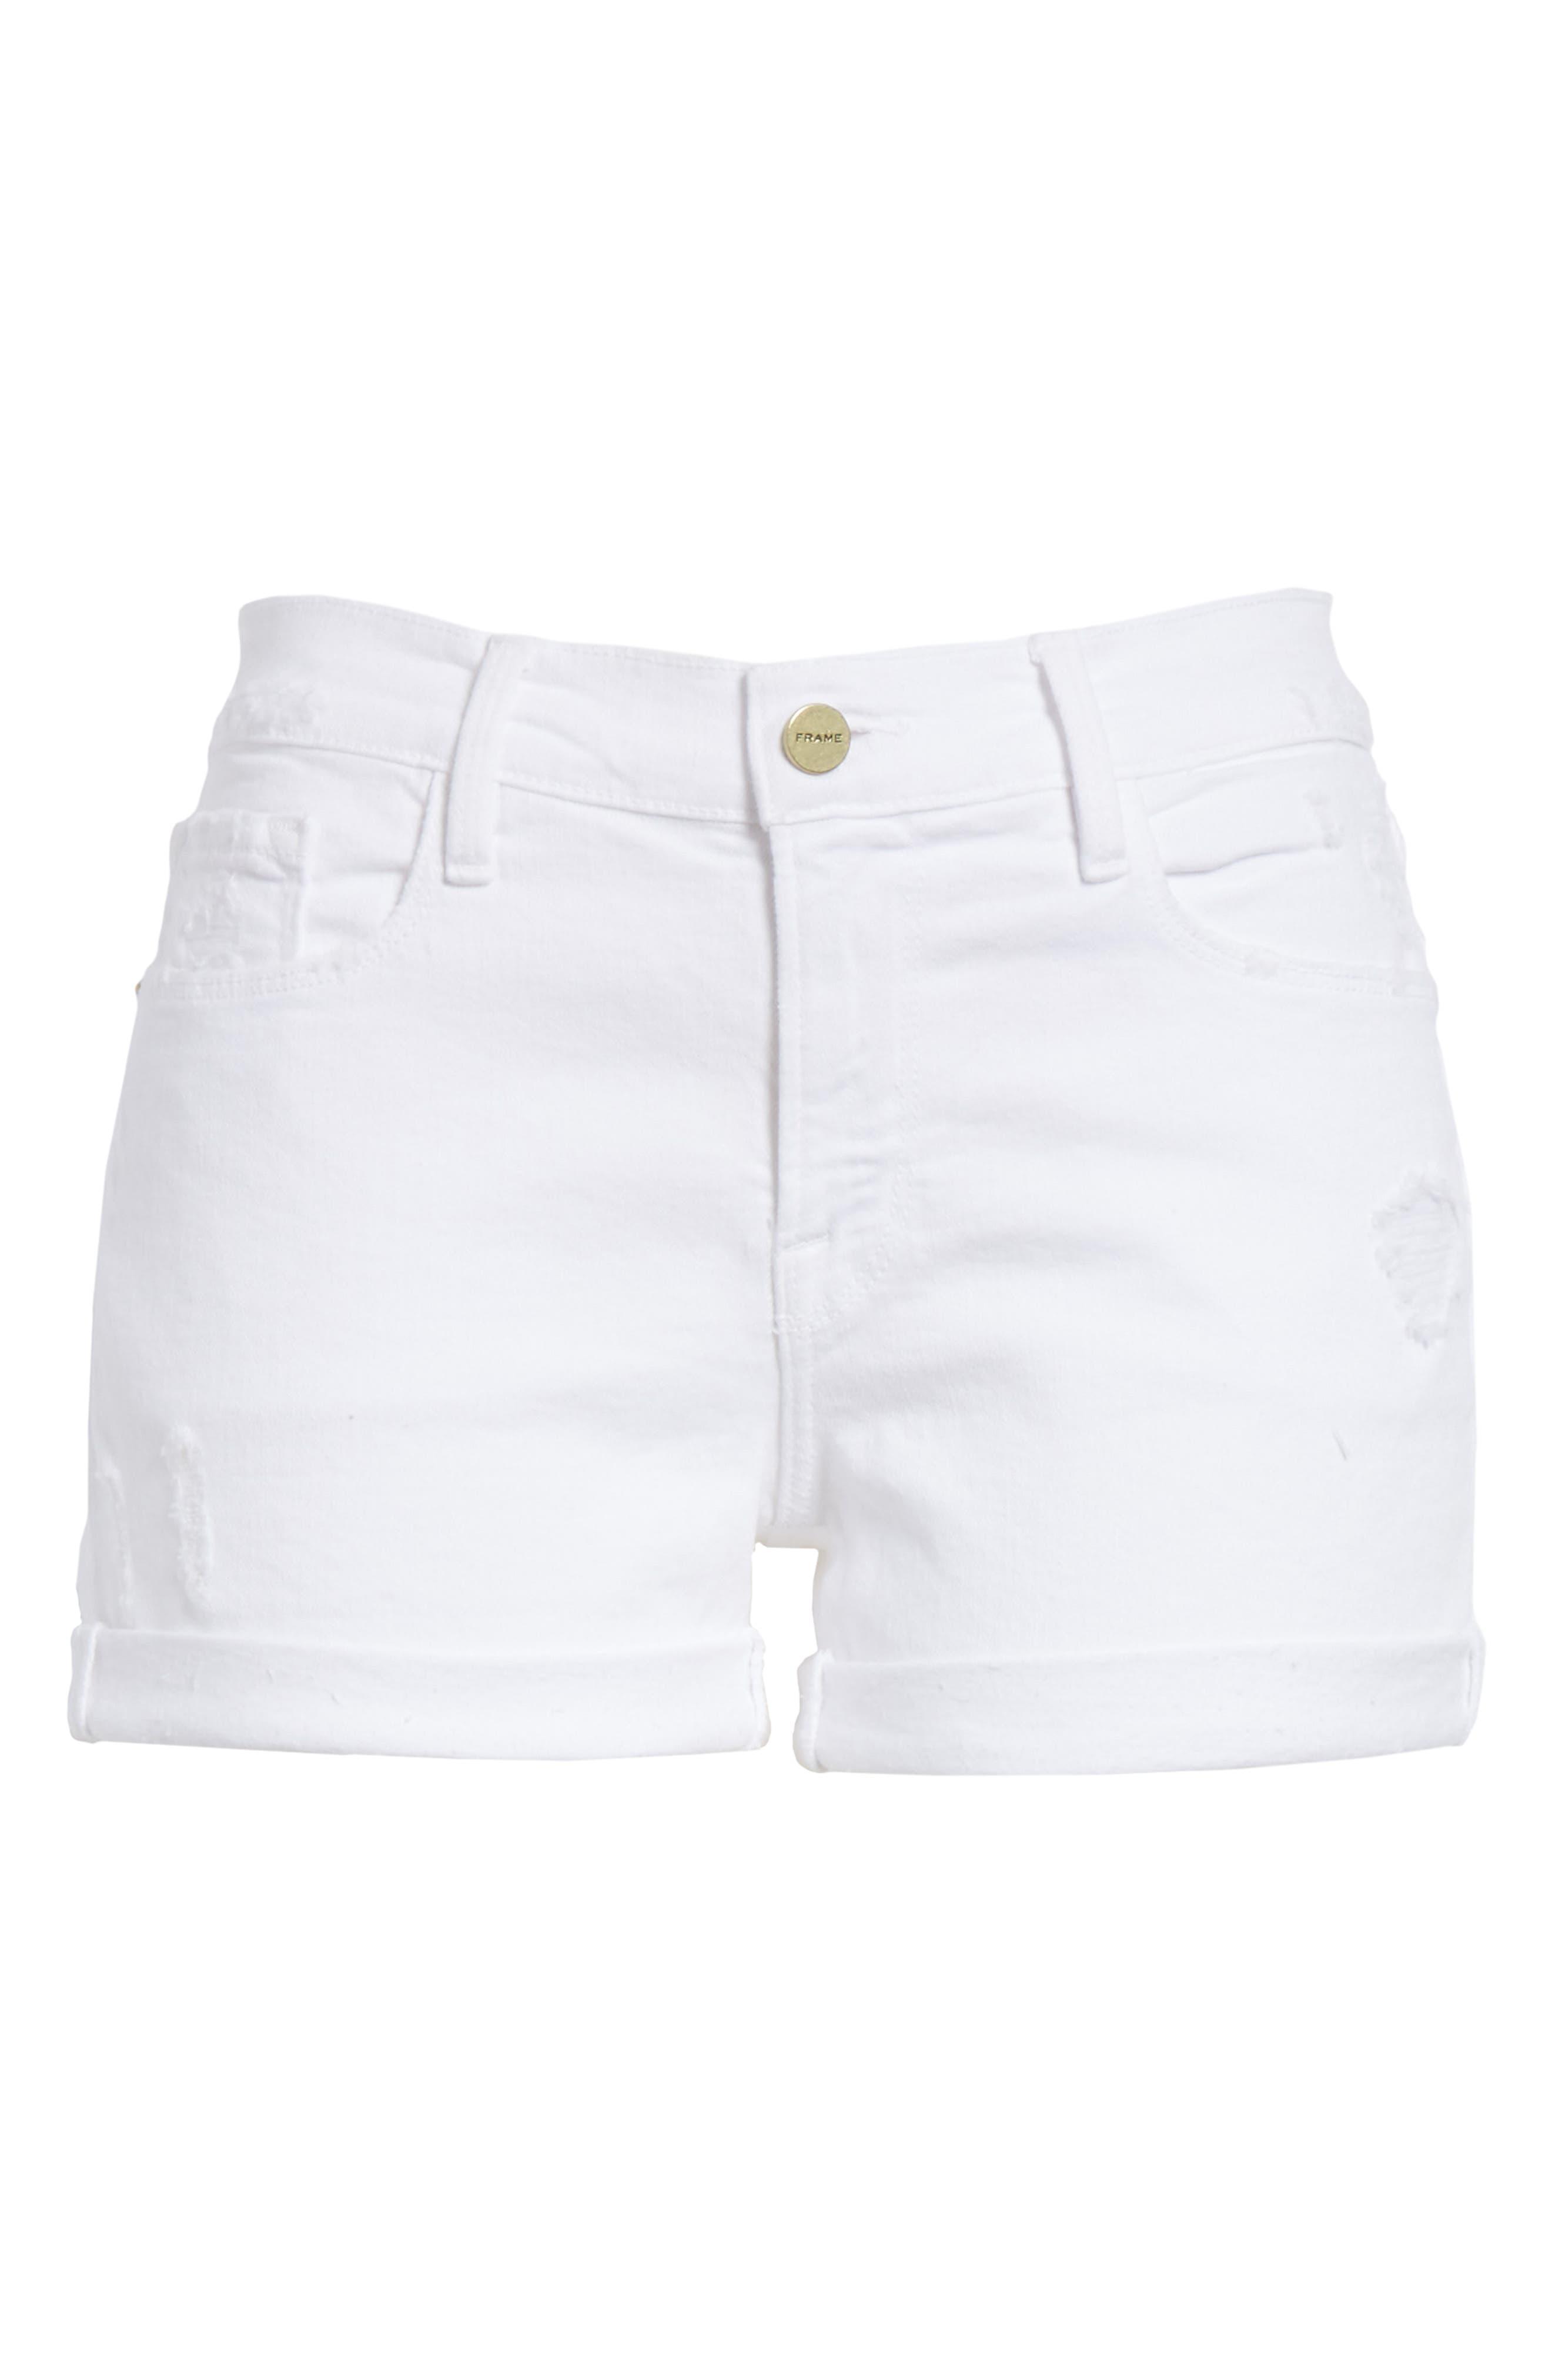 Le Cutoff Cuffed Jean Shorts,                             Alternate thumbnail 7, color,                             BLANC ROOKLEY